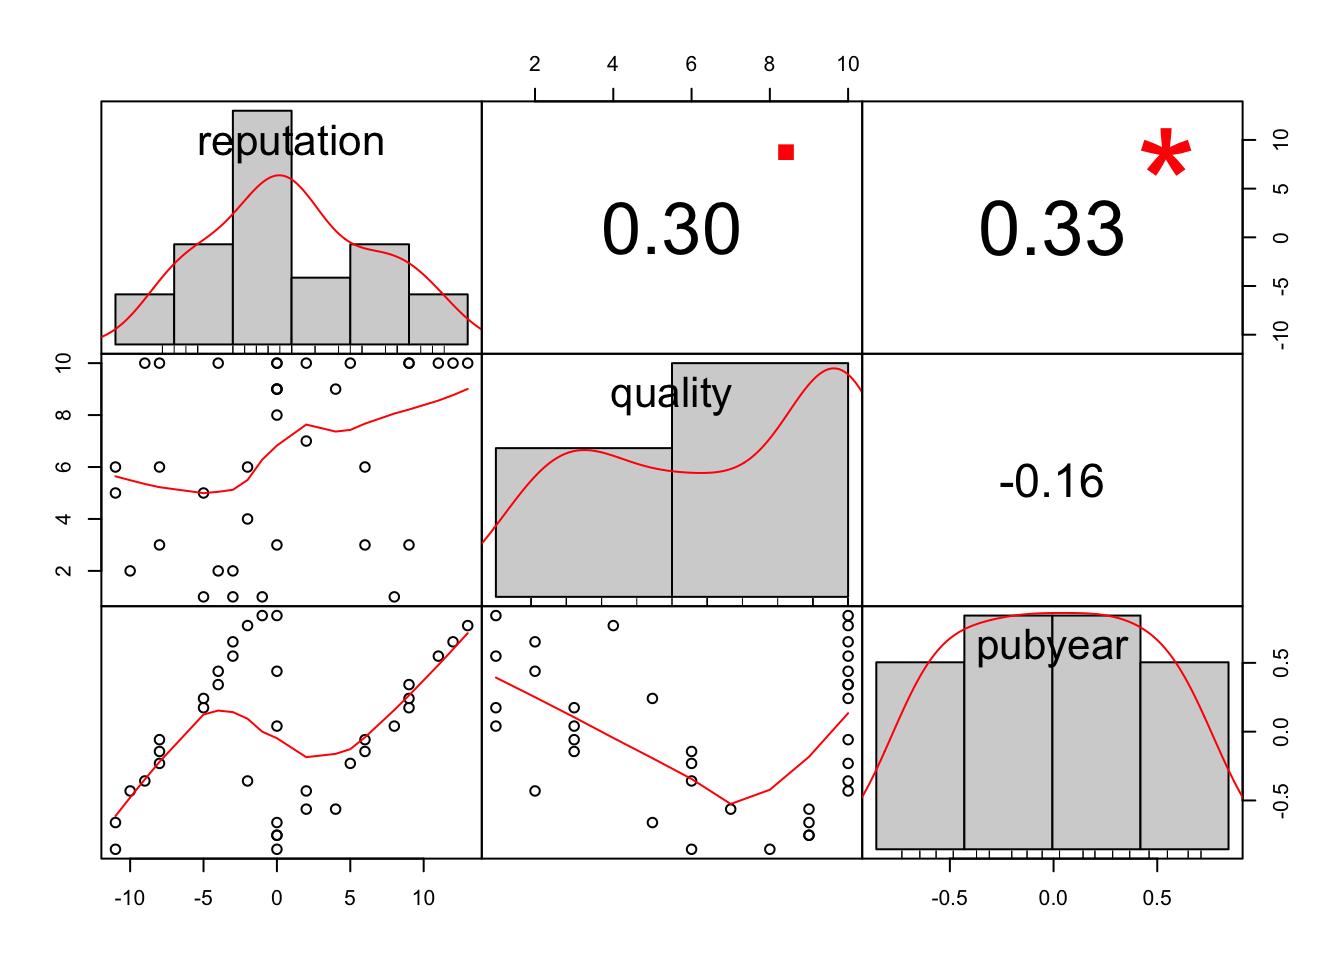 9 1 Small-study effect methods | Doing Meta-Analysis in R